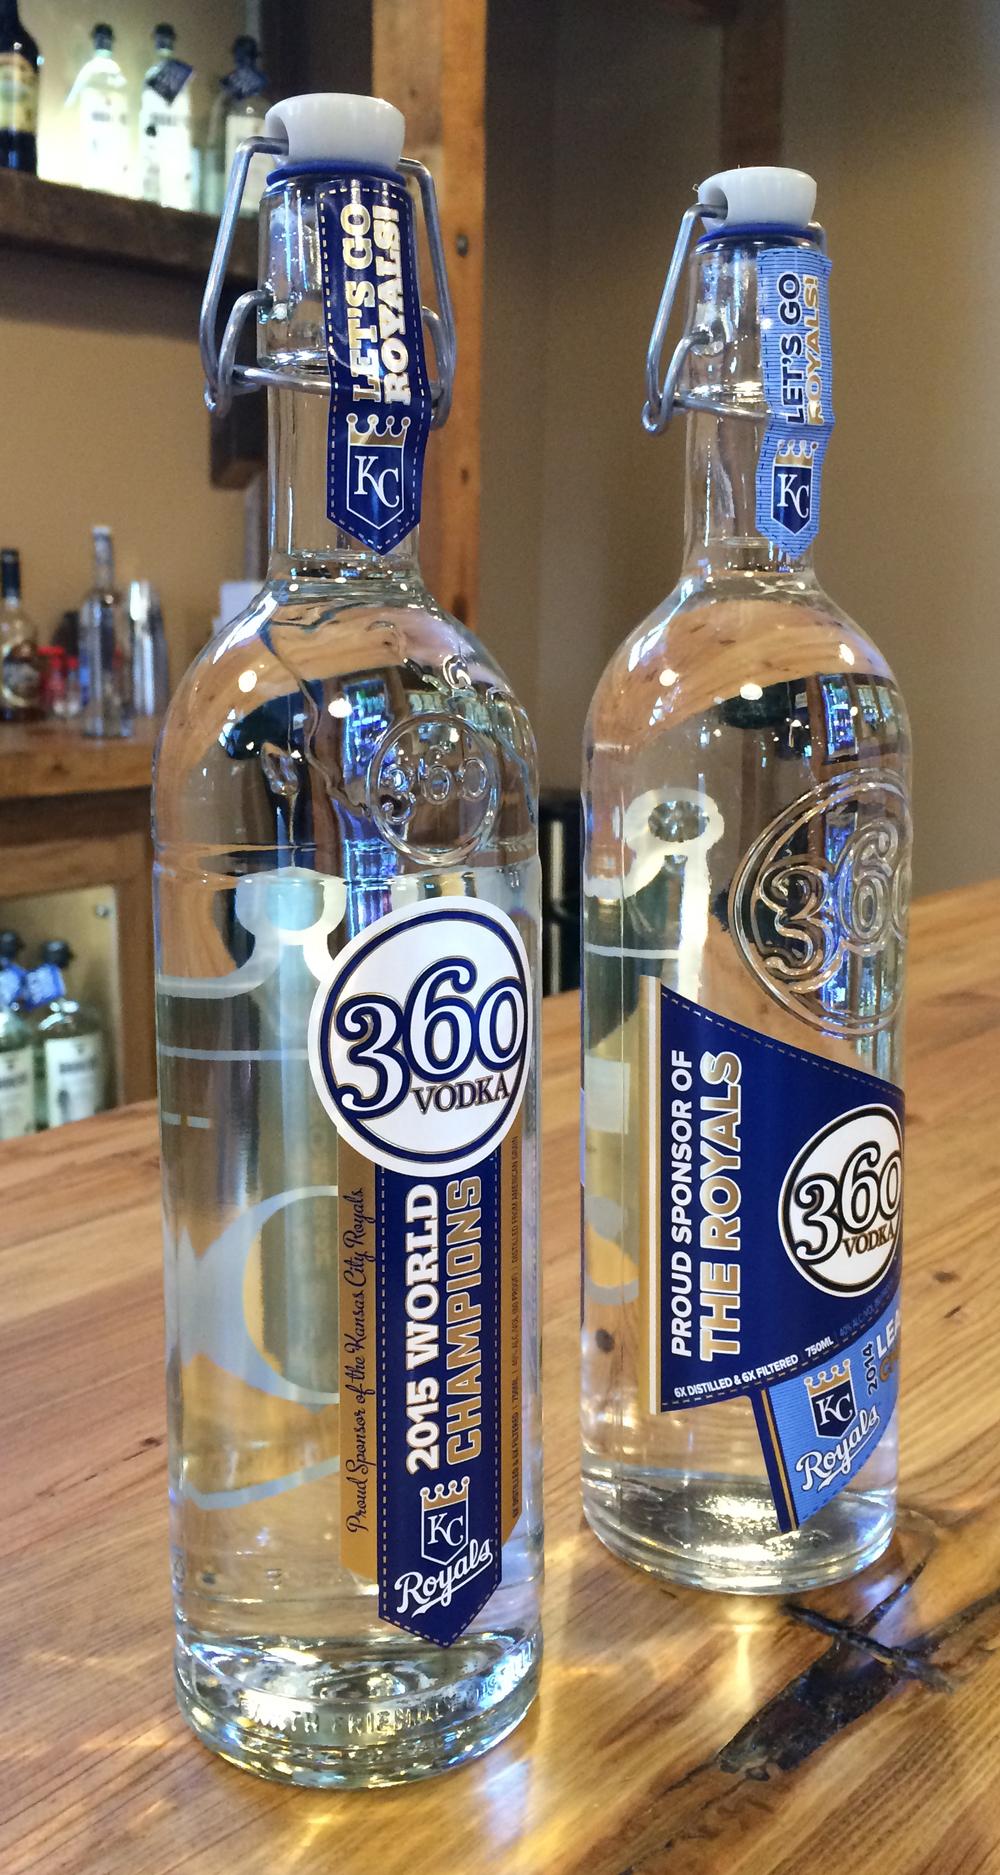 ROSS MARTIN/Citizen photo The 360 vodka 2015 commemorative edition (left) and the 2014 edition (right).